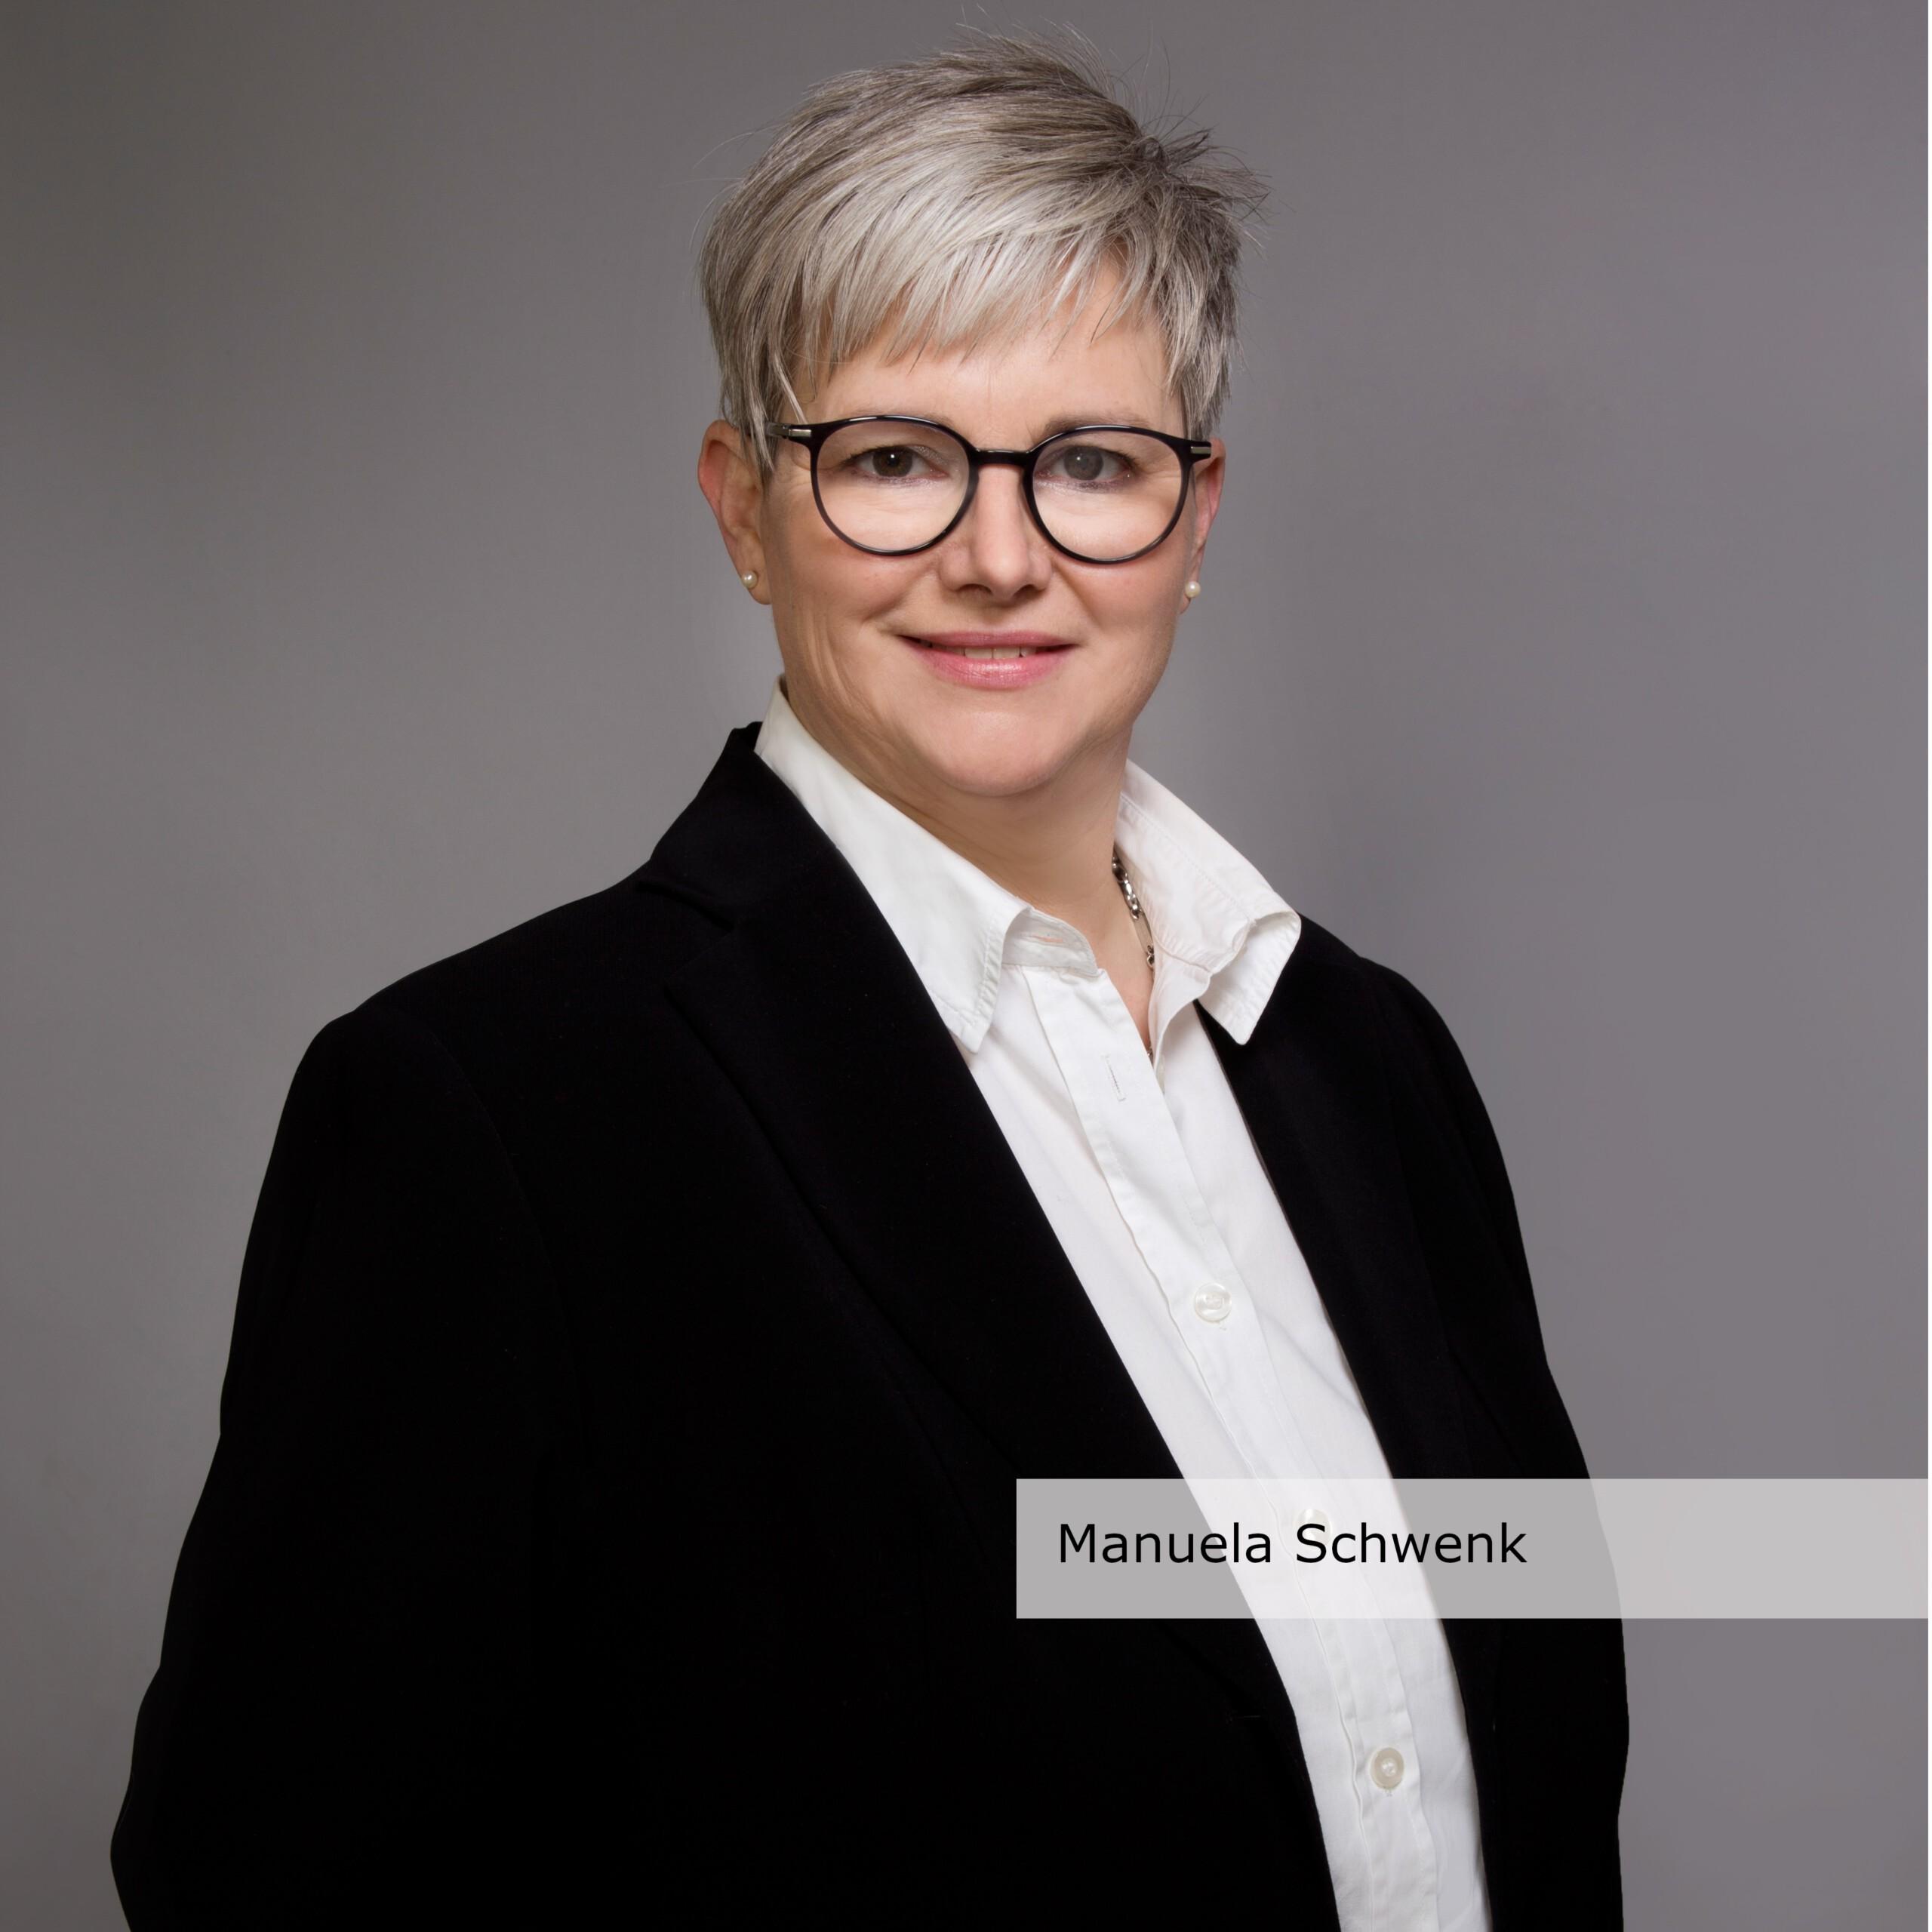 Manuela Schwenk